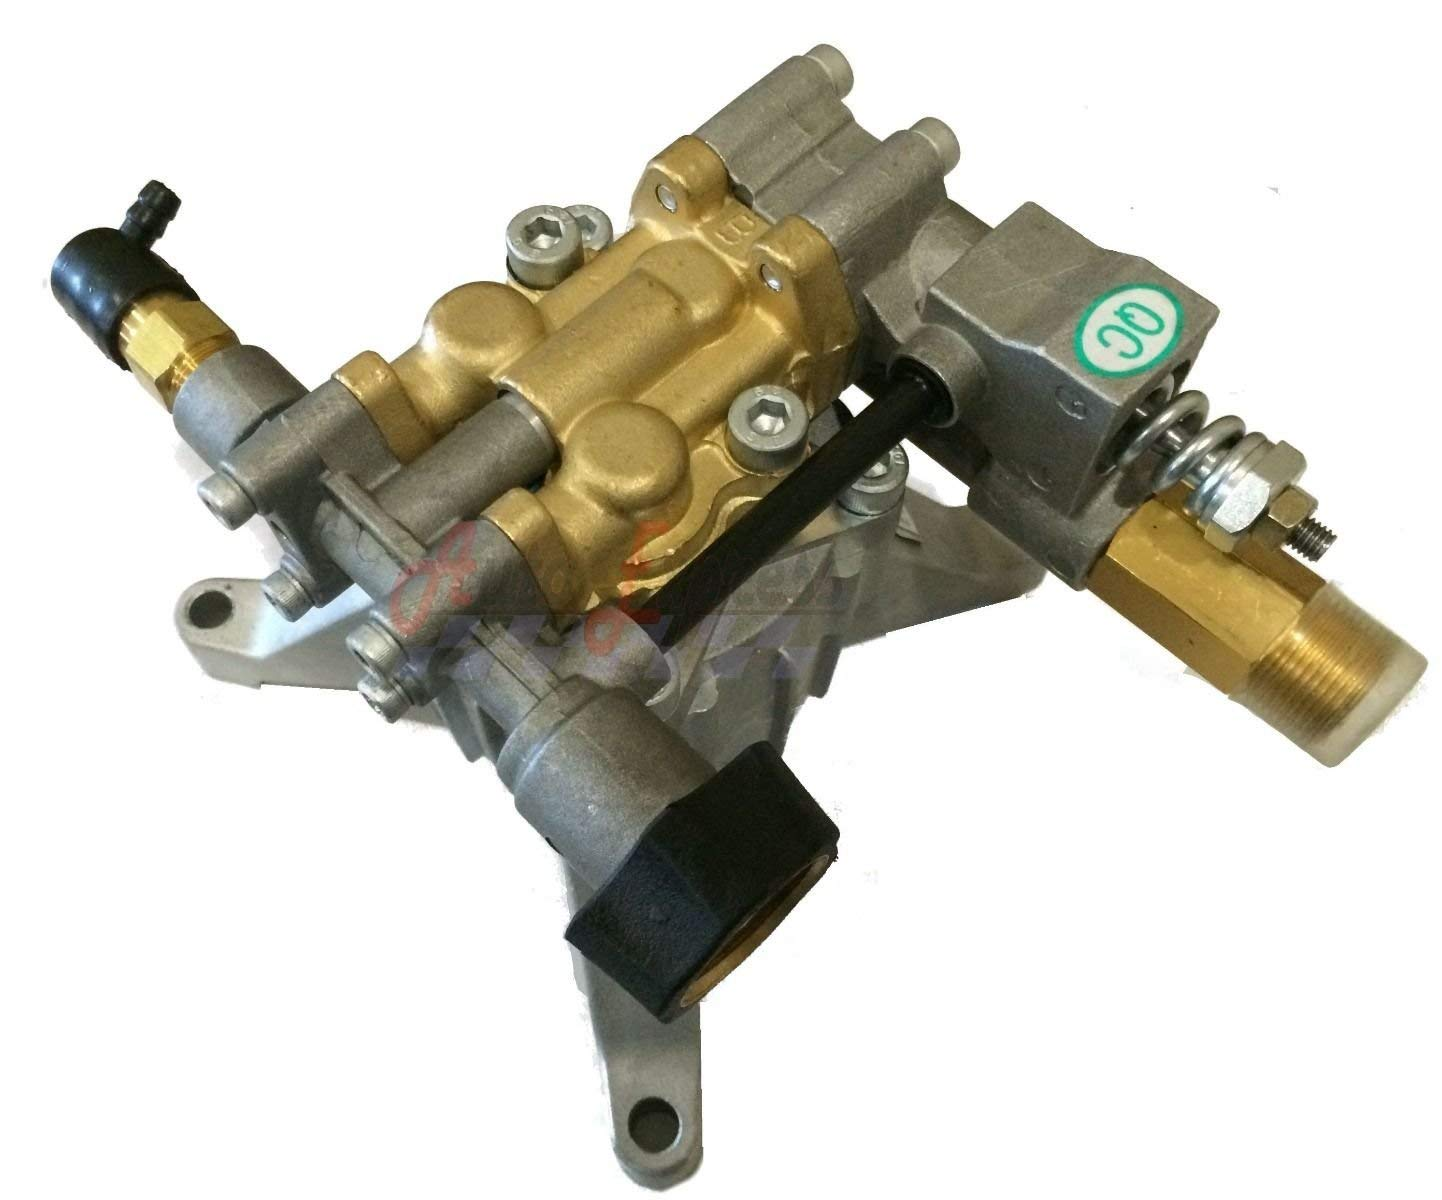 3100 PSI POWER PRESSURE WASHER WATER PUMP Upgraded Simpson MSV3000 --P#EWT43 65234R3FA740803